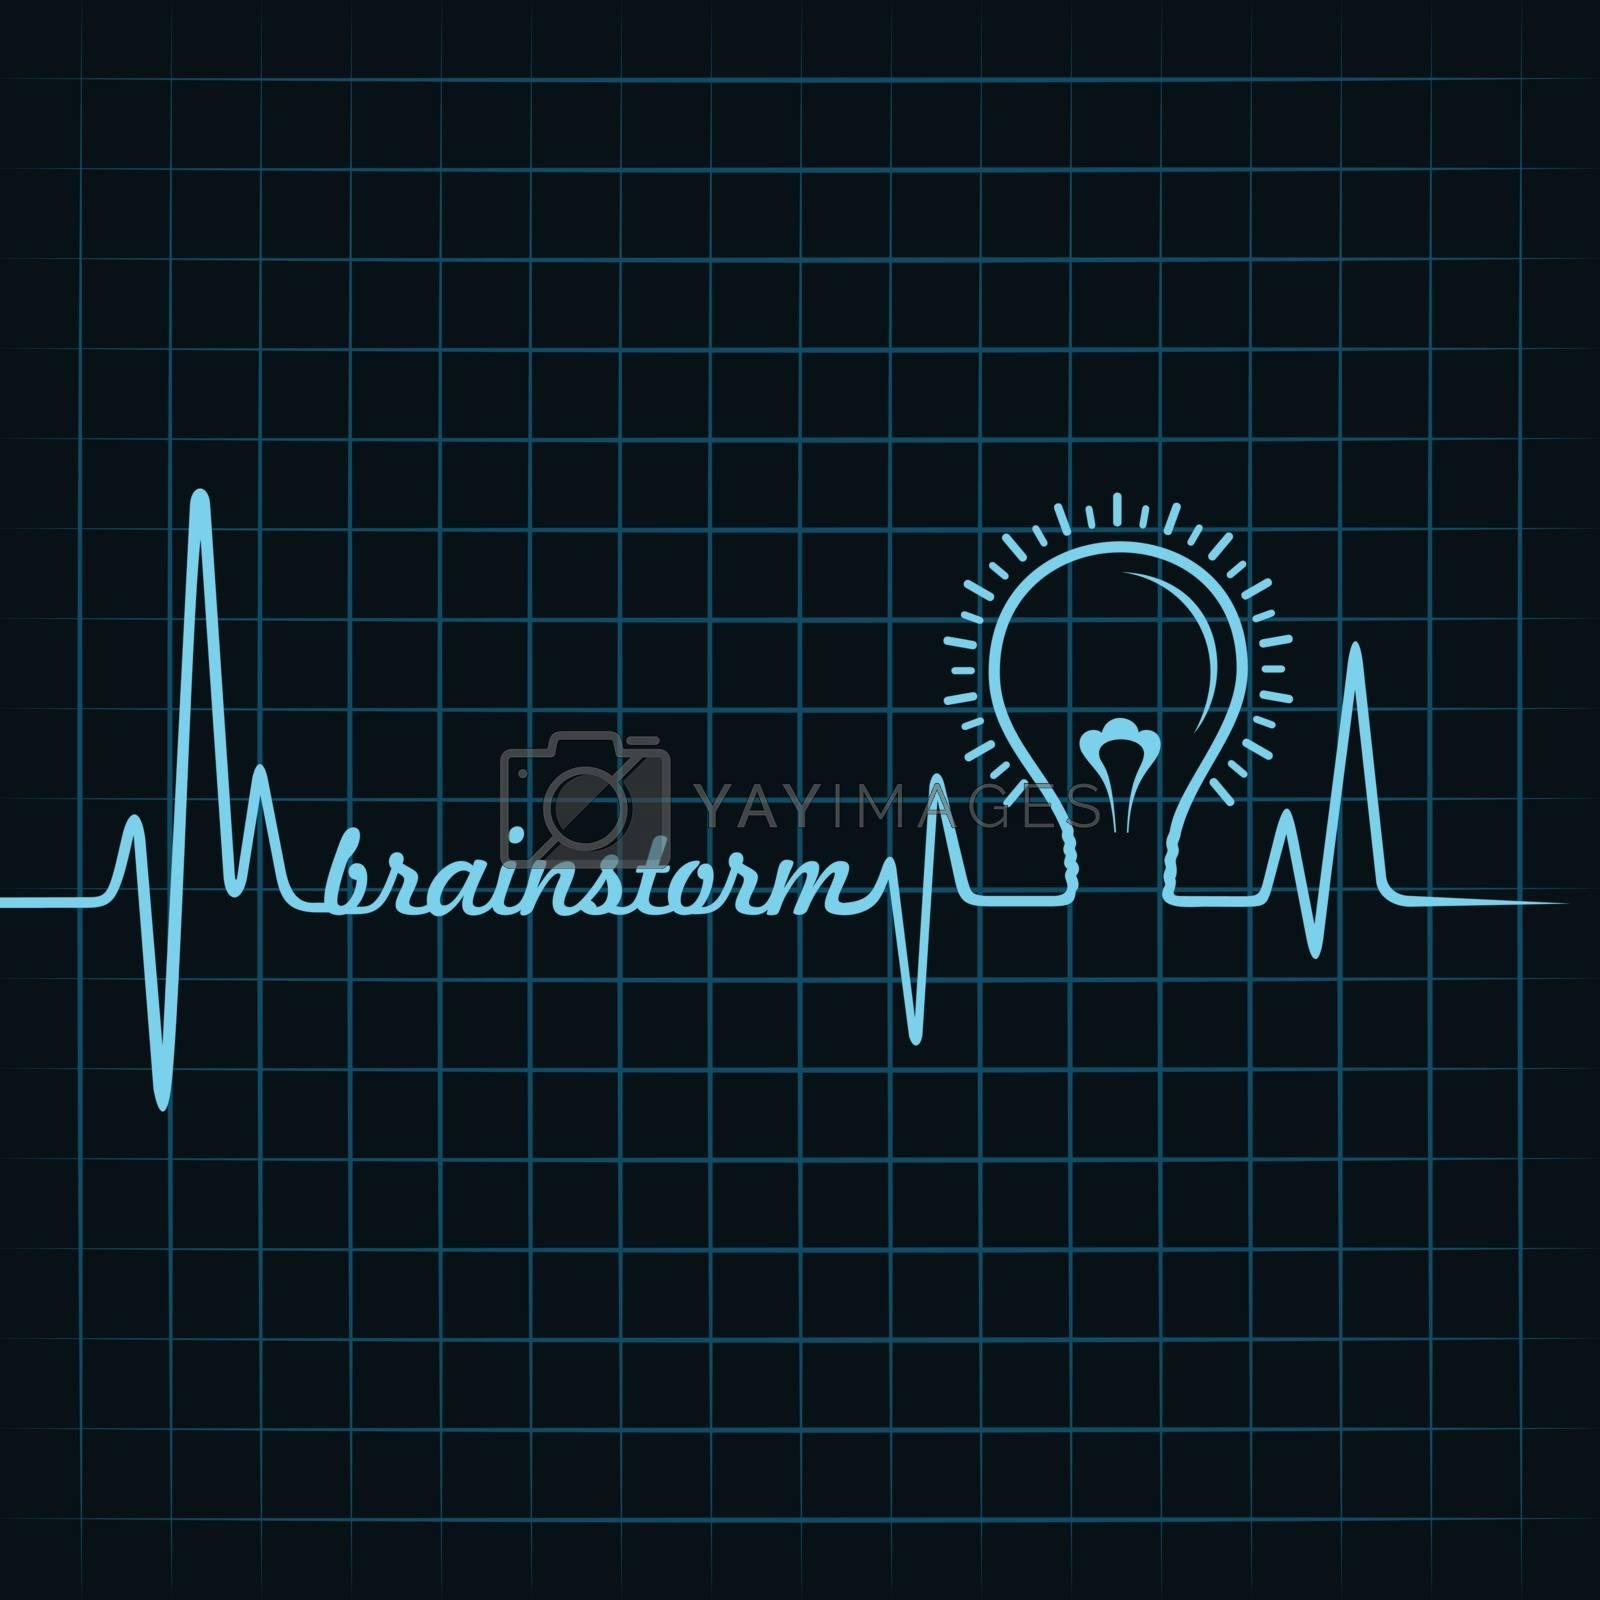 heartbeat make brainstorm word and light-bulb stock vector